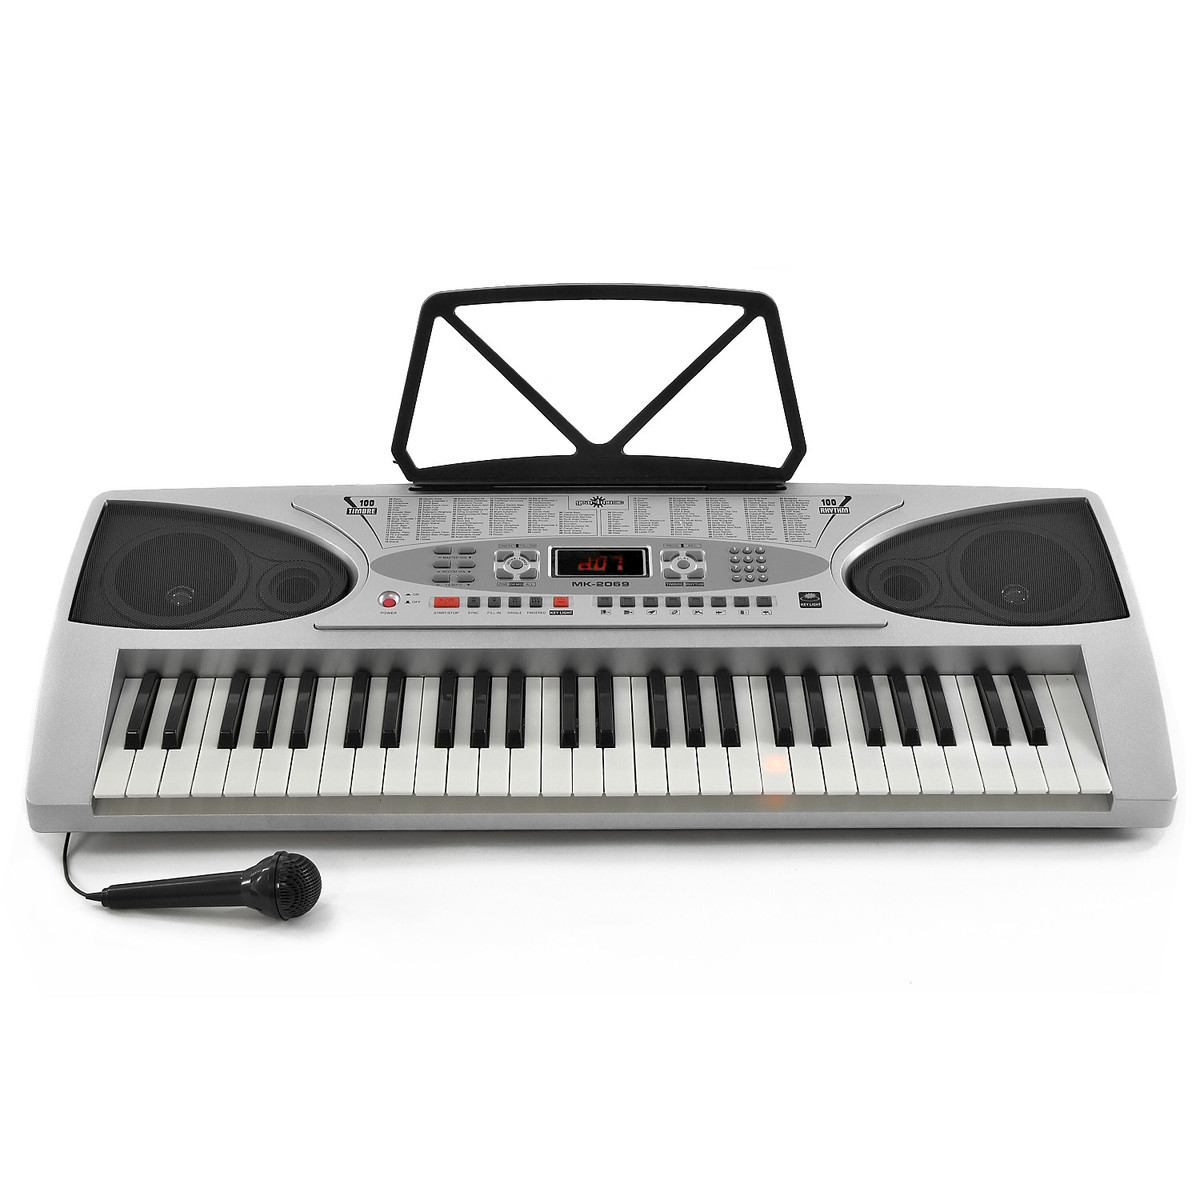 mk 3000 key lighting keyboard by gear4music ex demo at gear4music. Black Bedroom Furniture Sets. Home Design Ideas